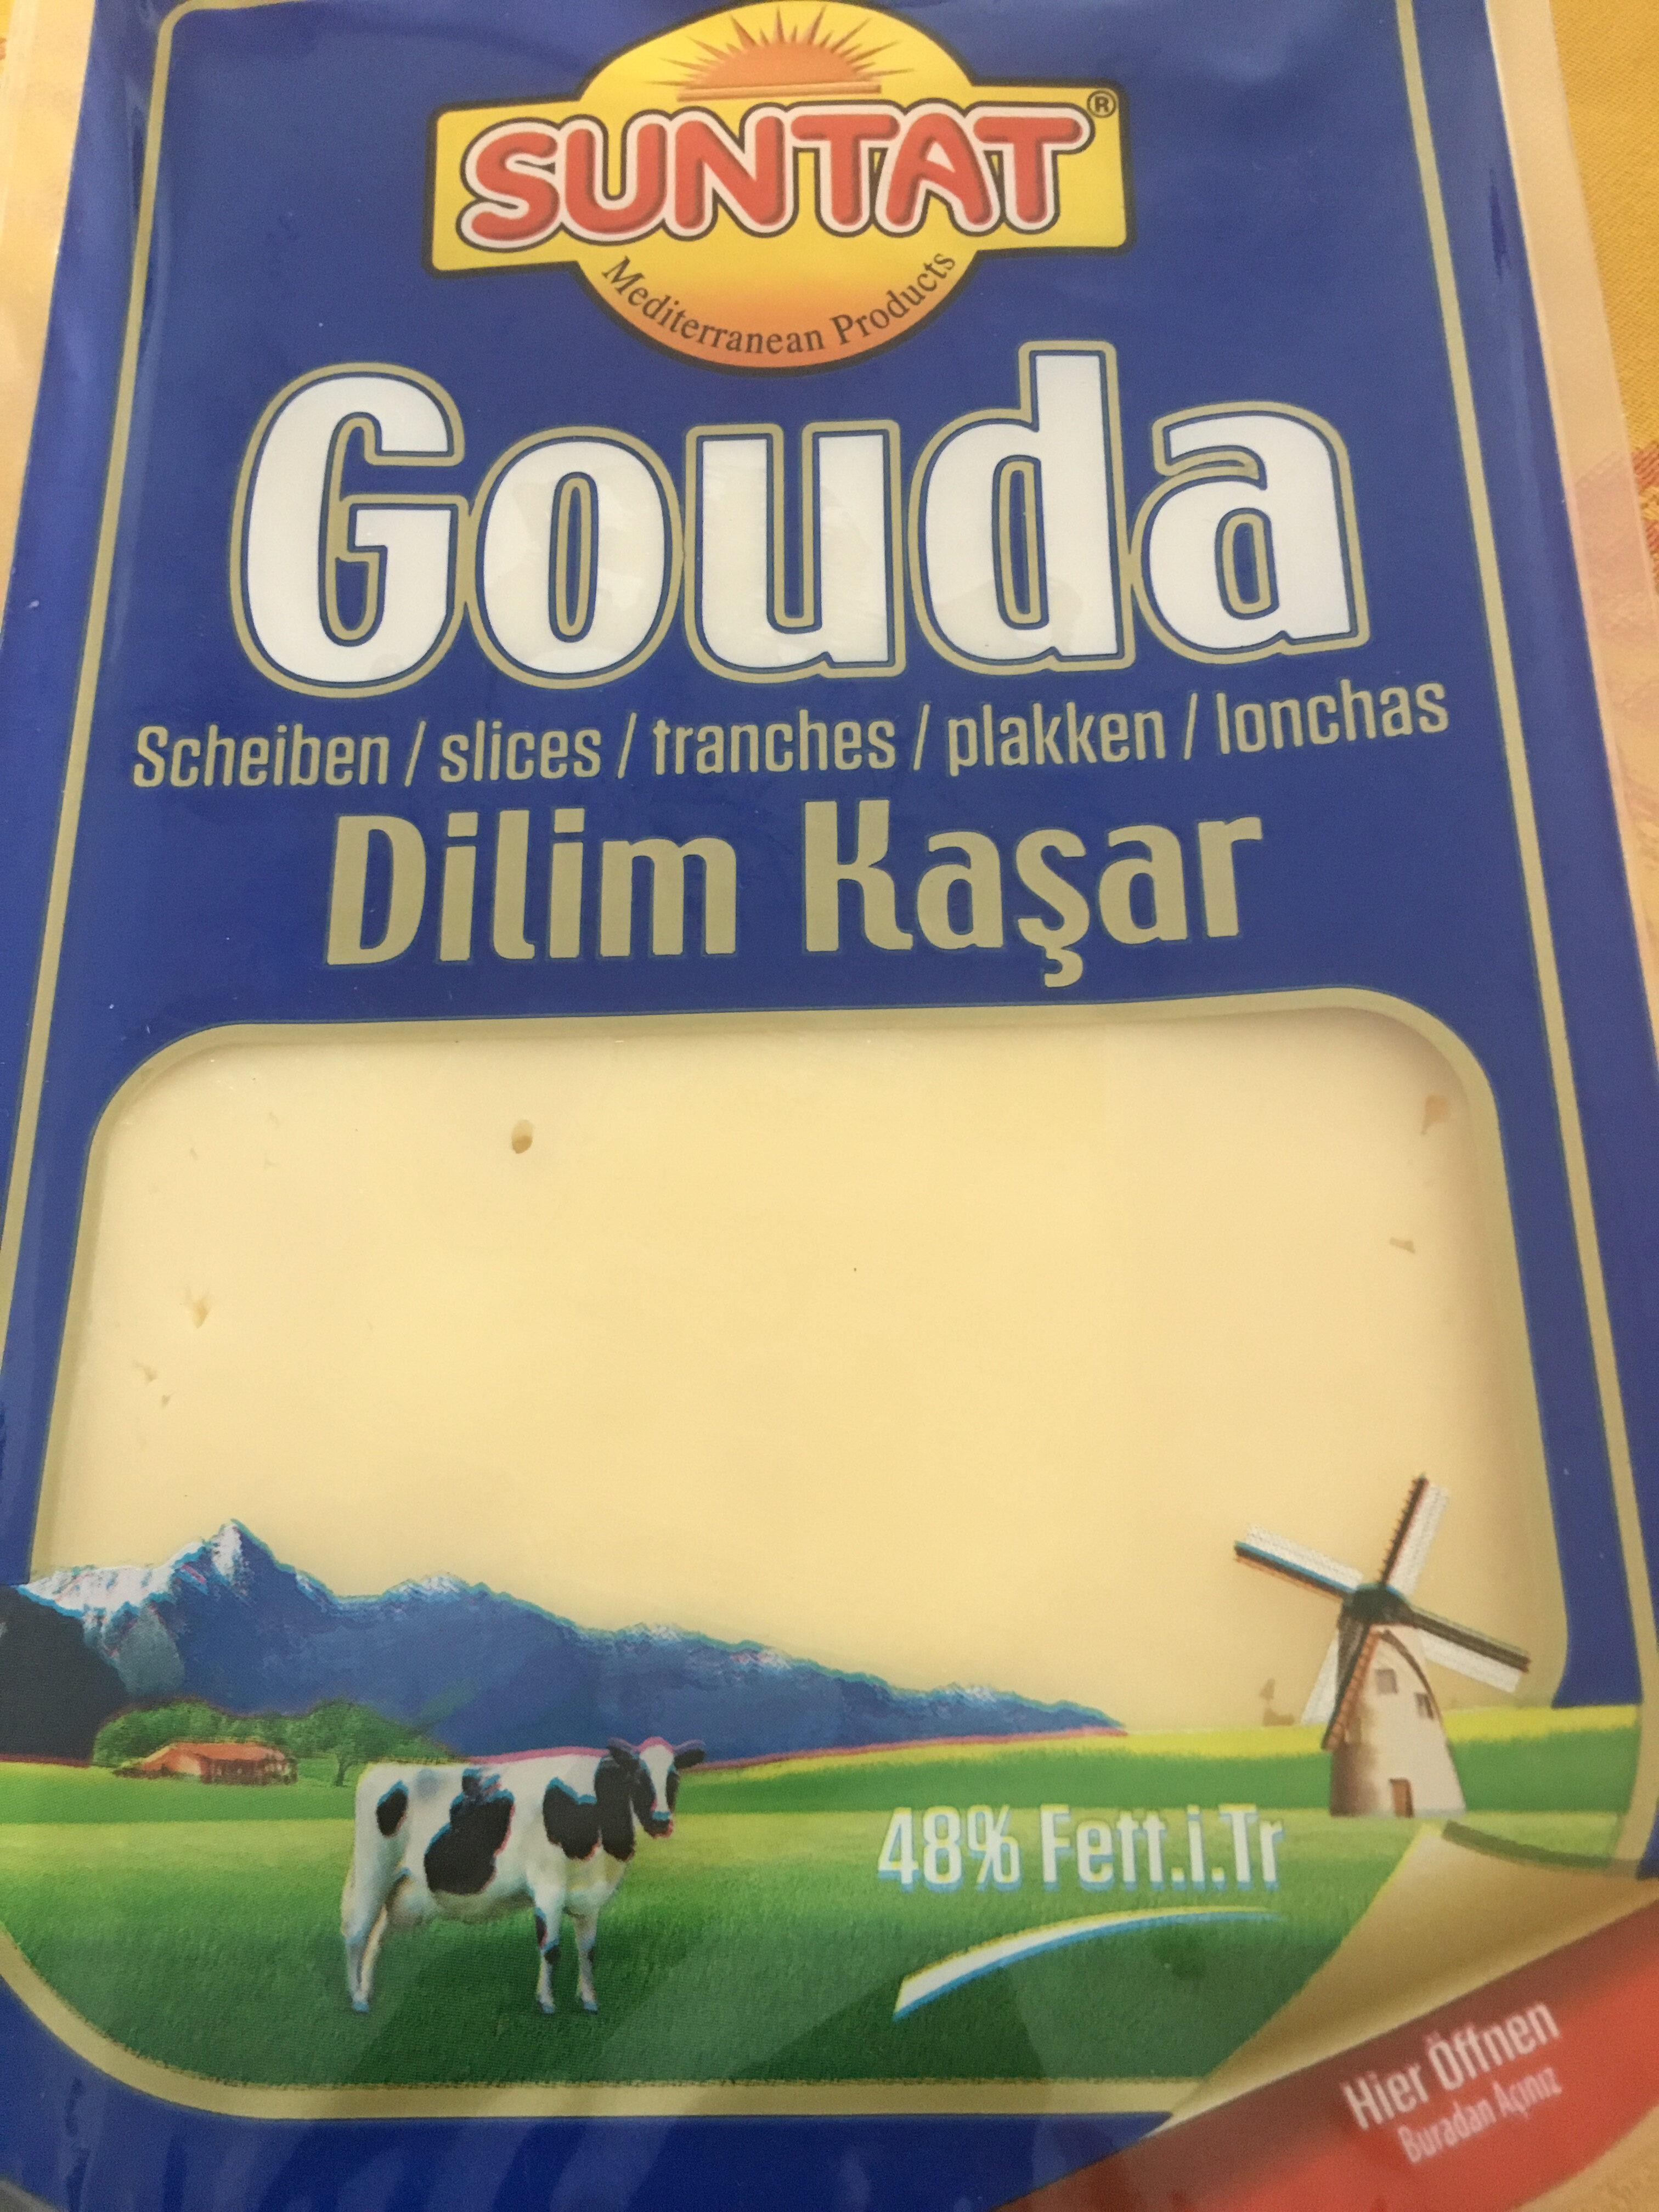 Gouda Cheese Sliced - Product - fr